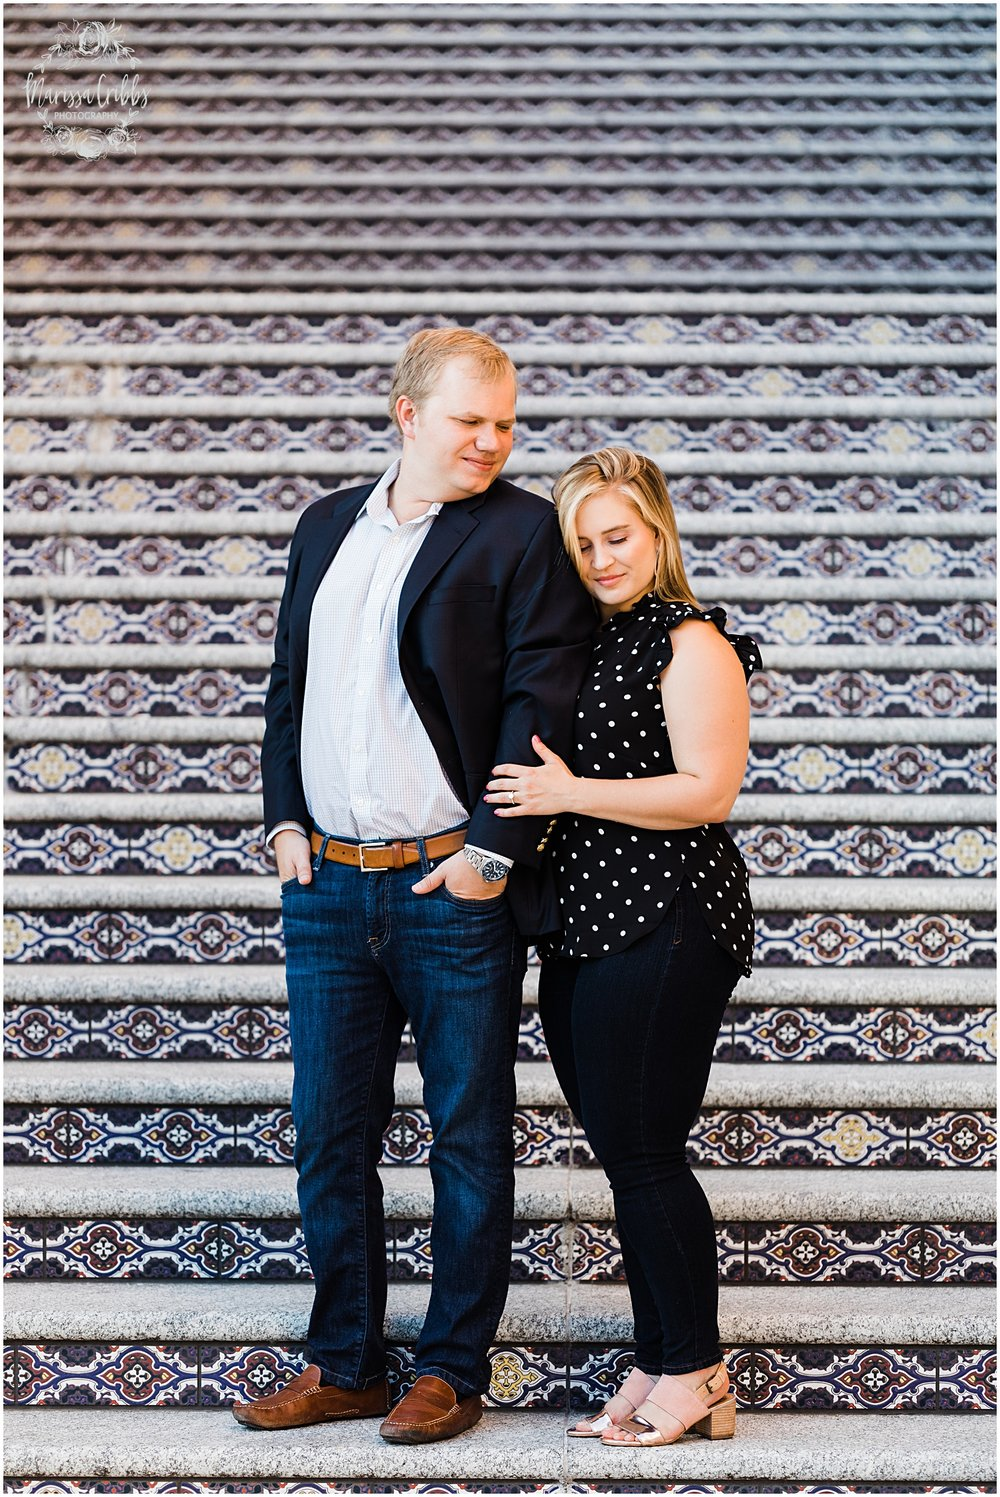 Scott & Rachel Engagement | Hi Hat Coffee and Plaza | Marissa Cribbs Photography_6236.jpg